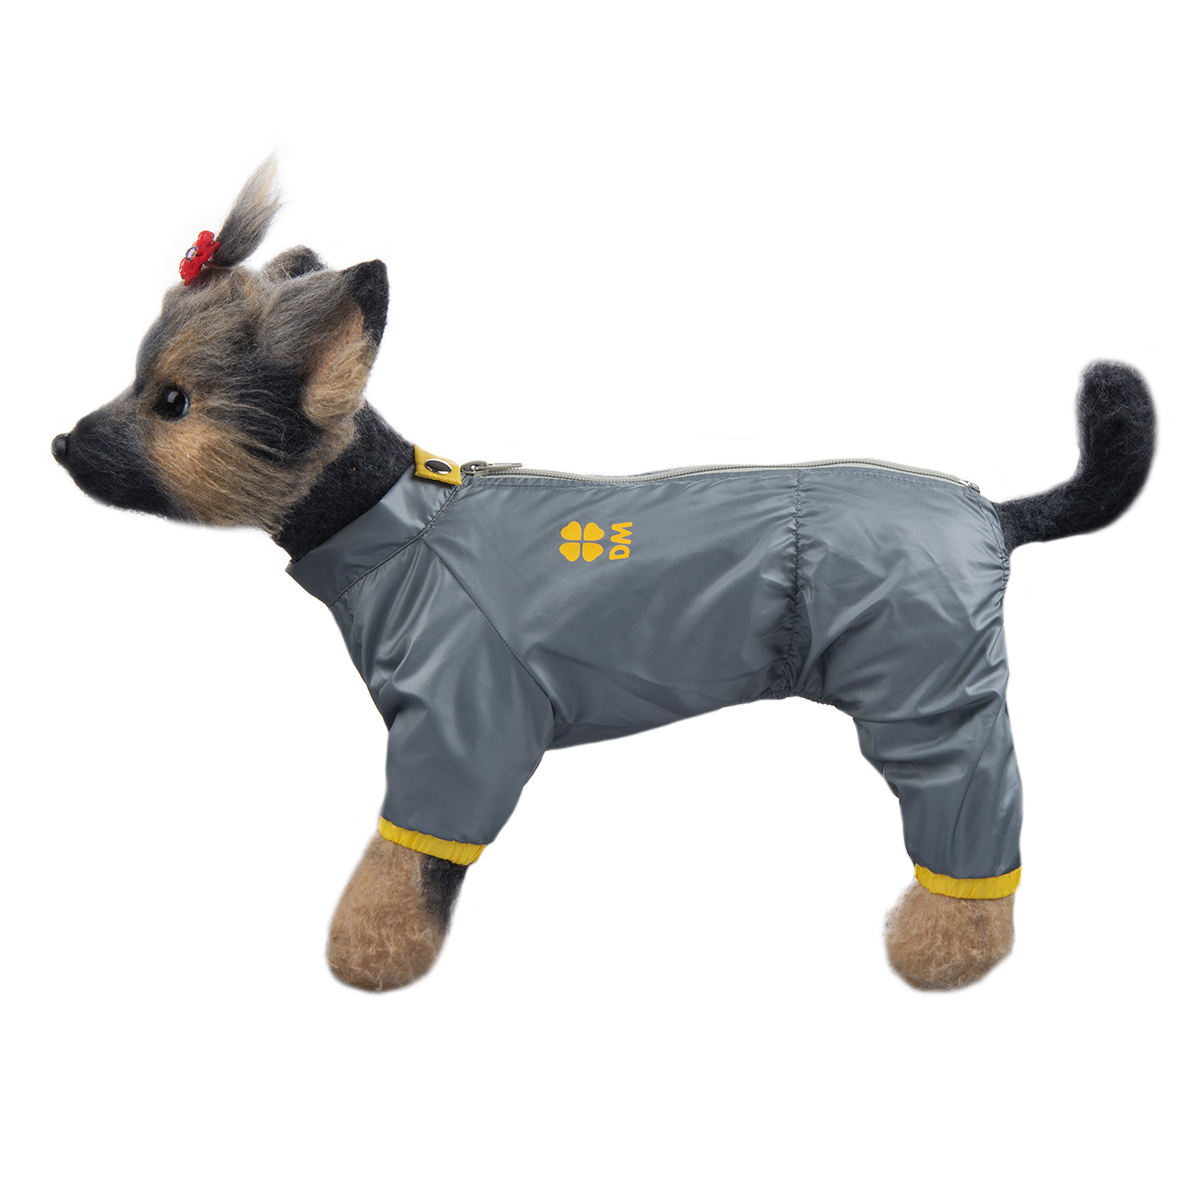 "Комбинезон для собак Dogmoda ""Тревел"", унисекс, цвет: серый, желтый. Размер 4 (XL)"